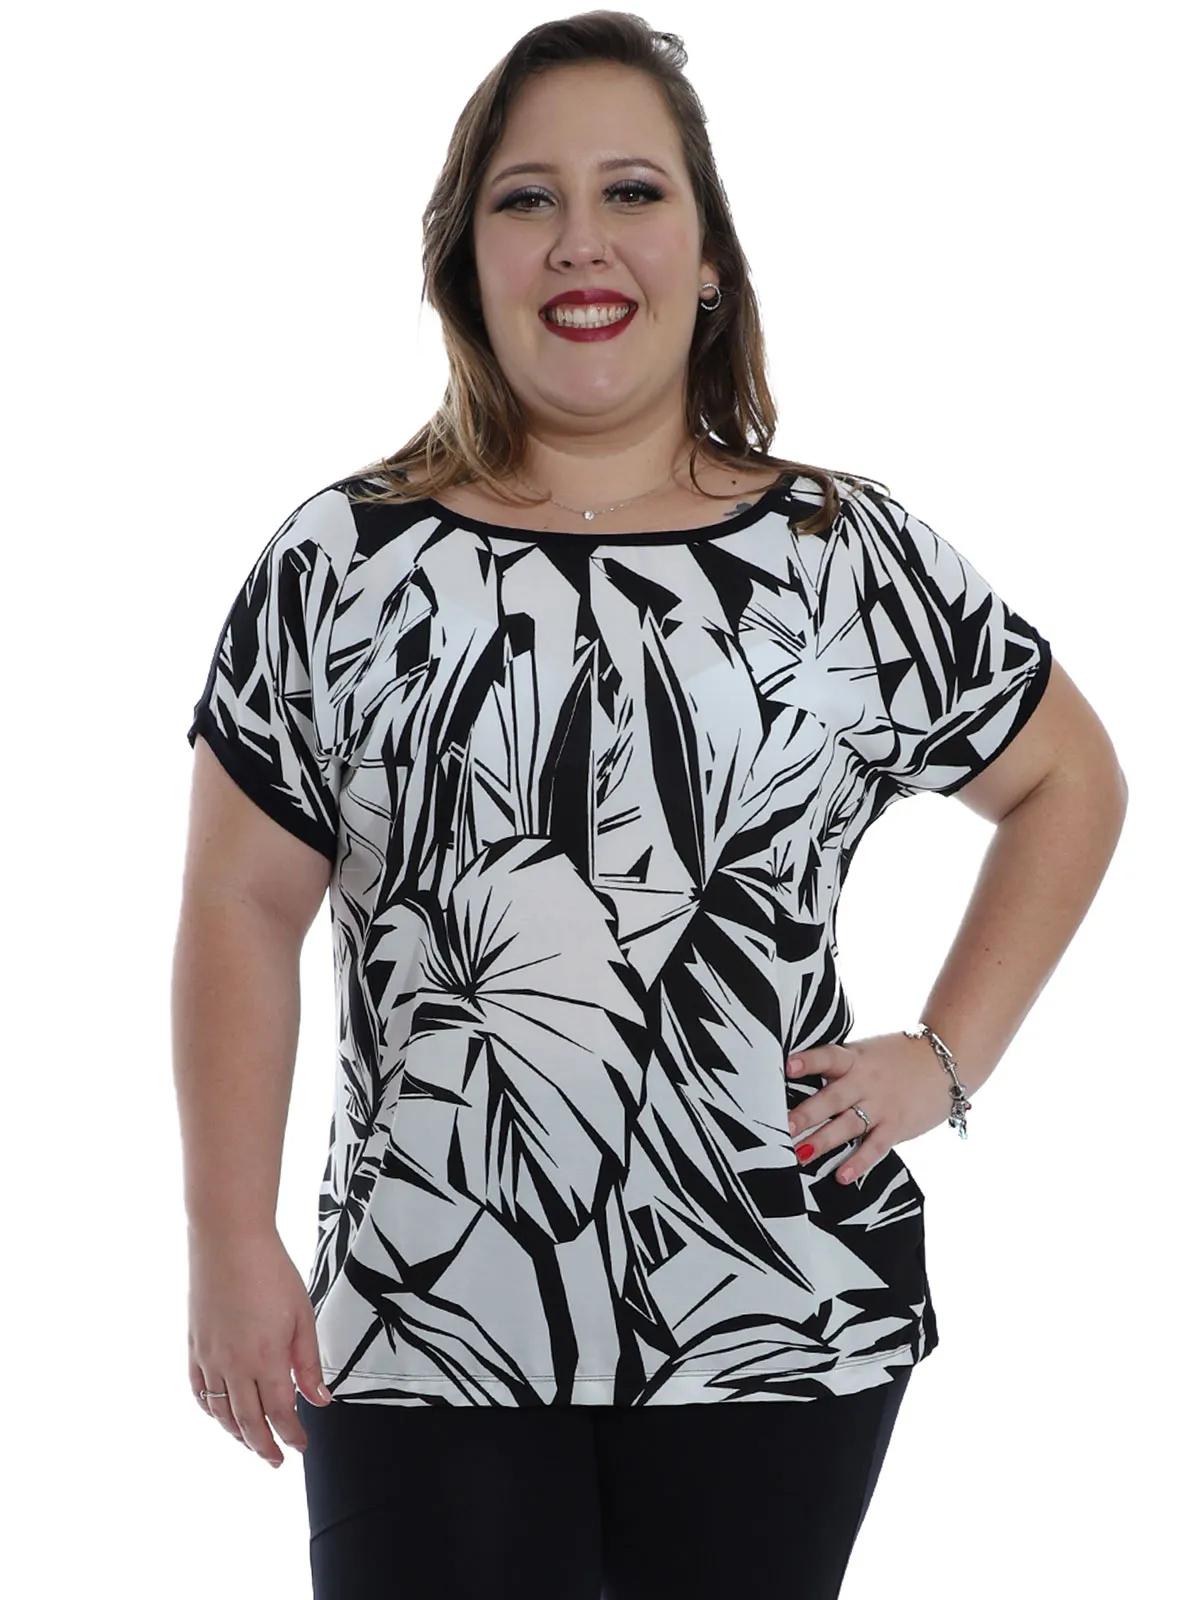 Blusa Plus Size Feminina Decote Redondo Estampada Preta